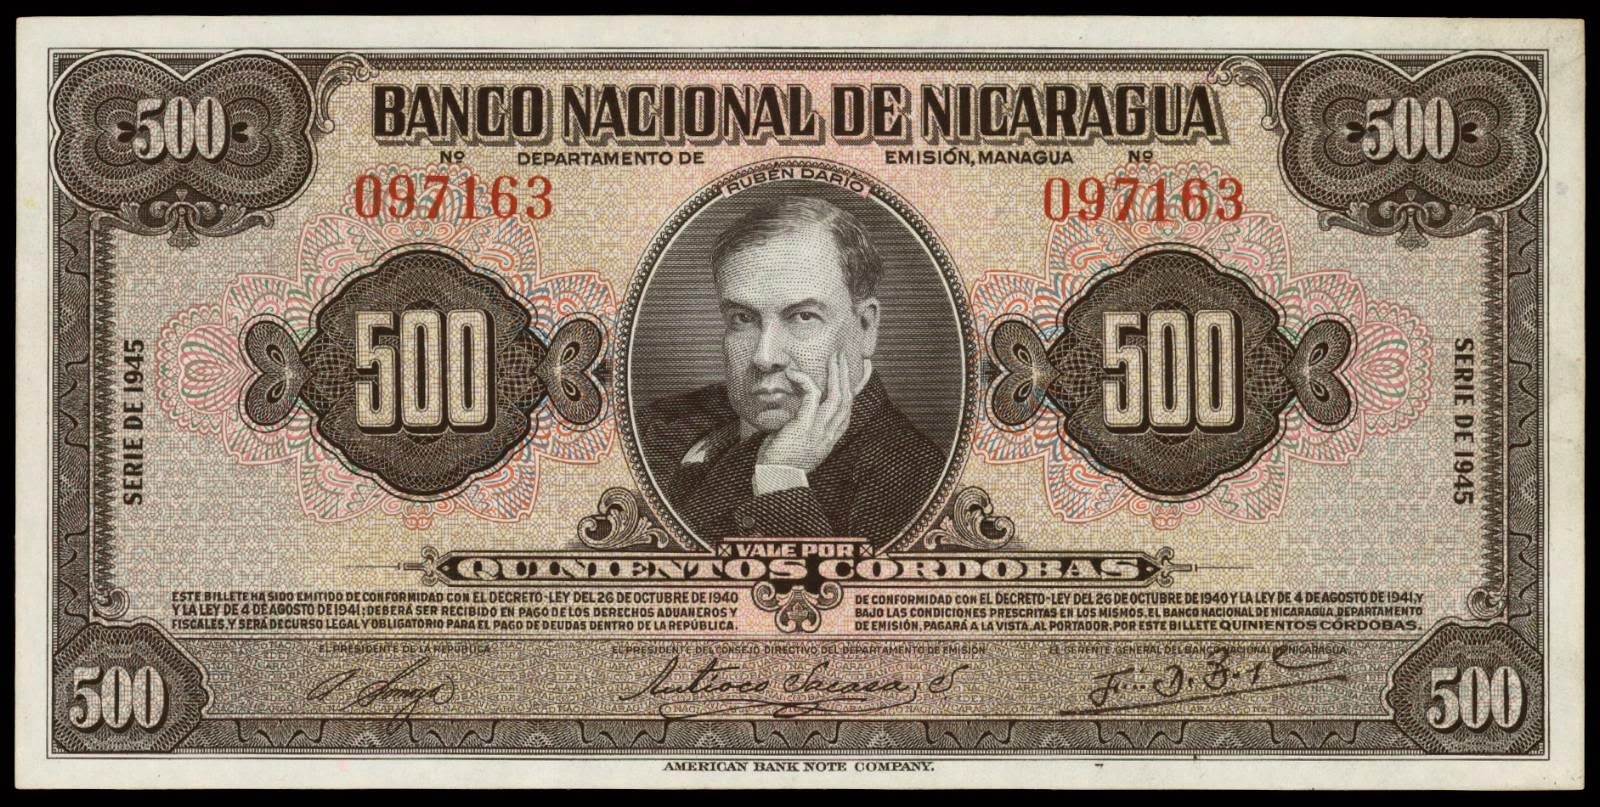 Nicaragua banknotes currency 500 Cordobas bank note 1945 Ruben Dario